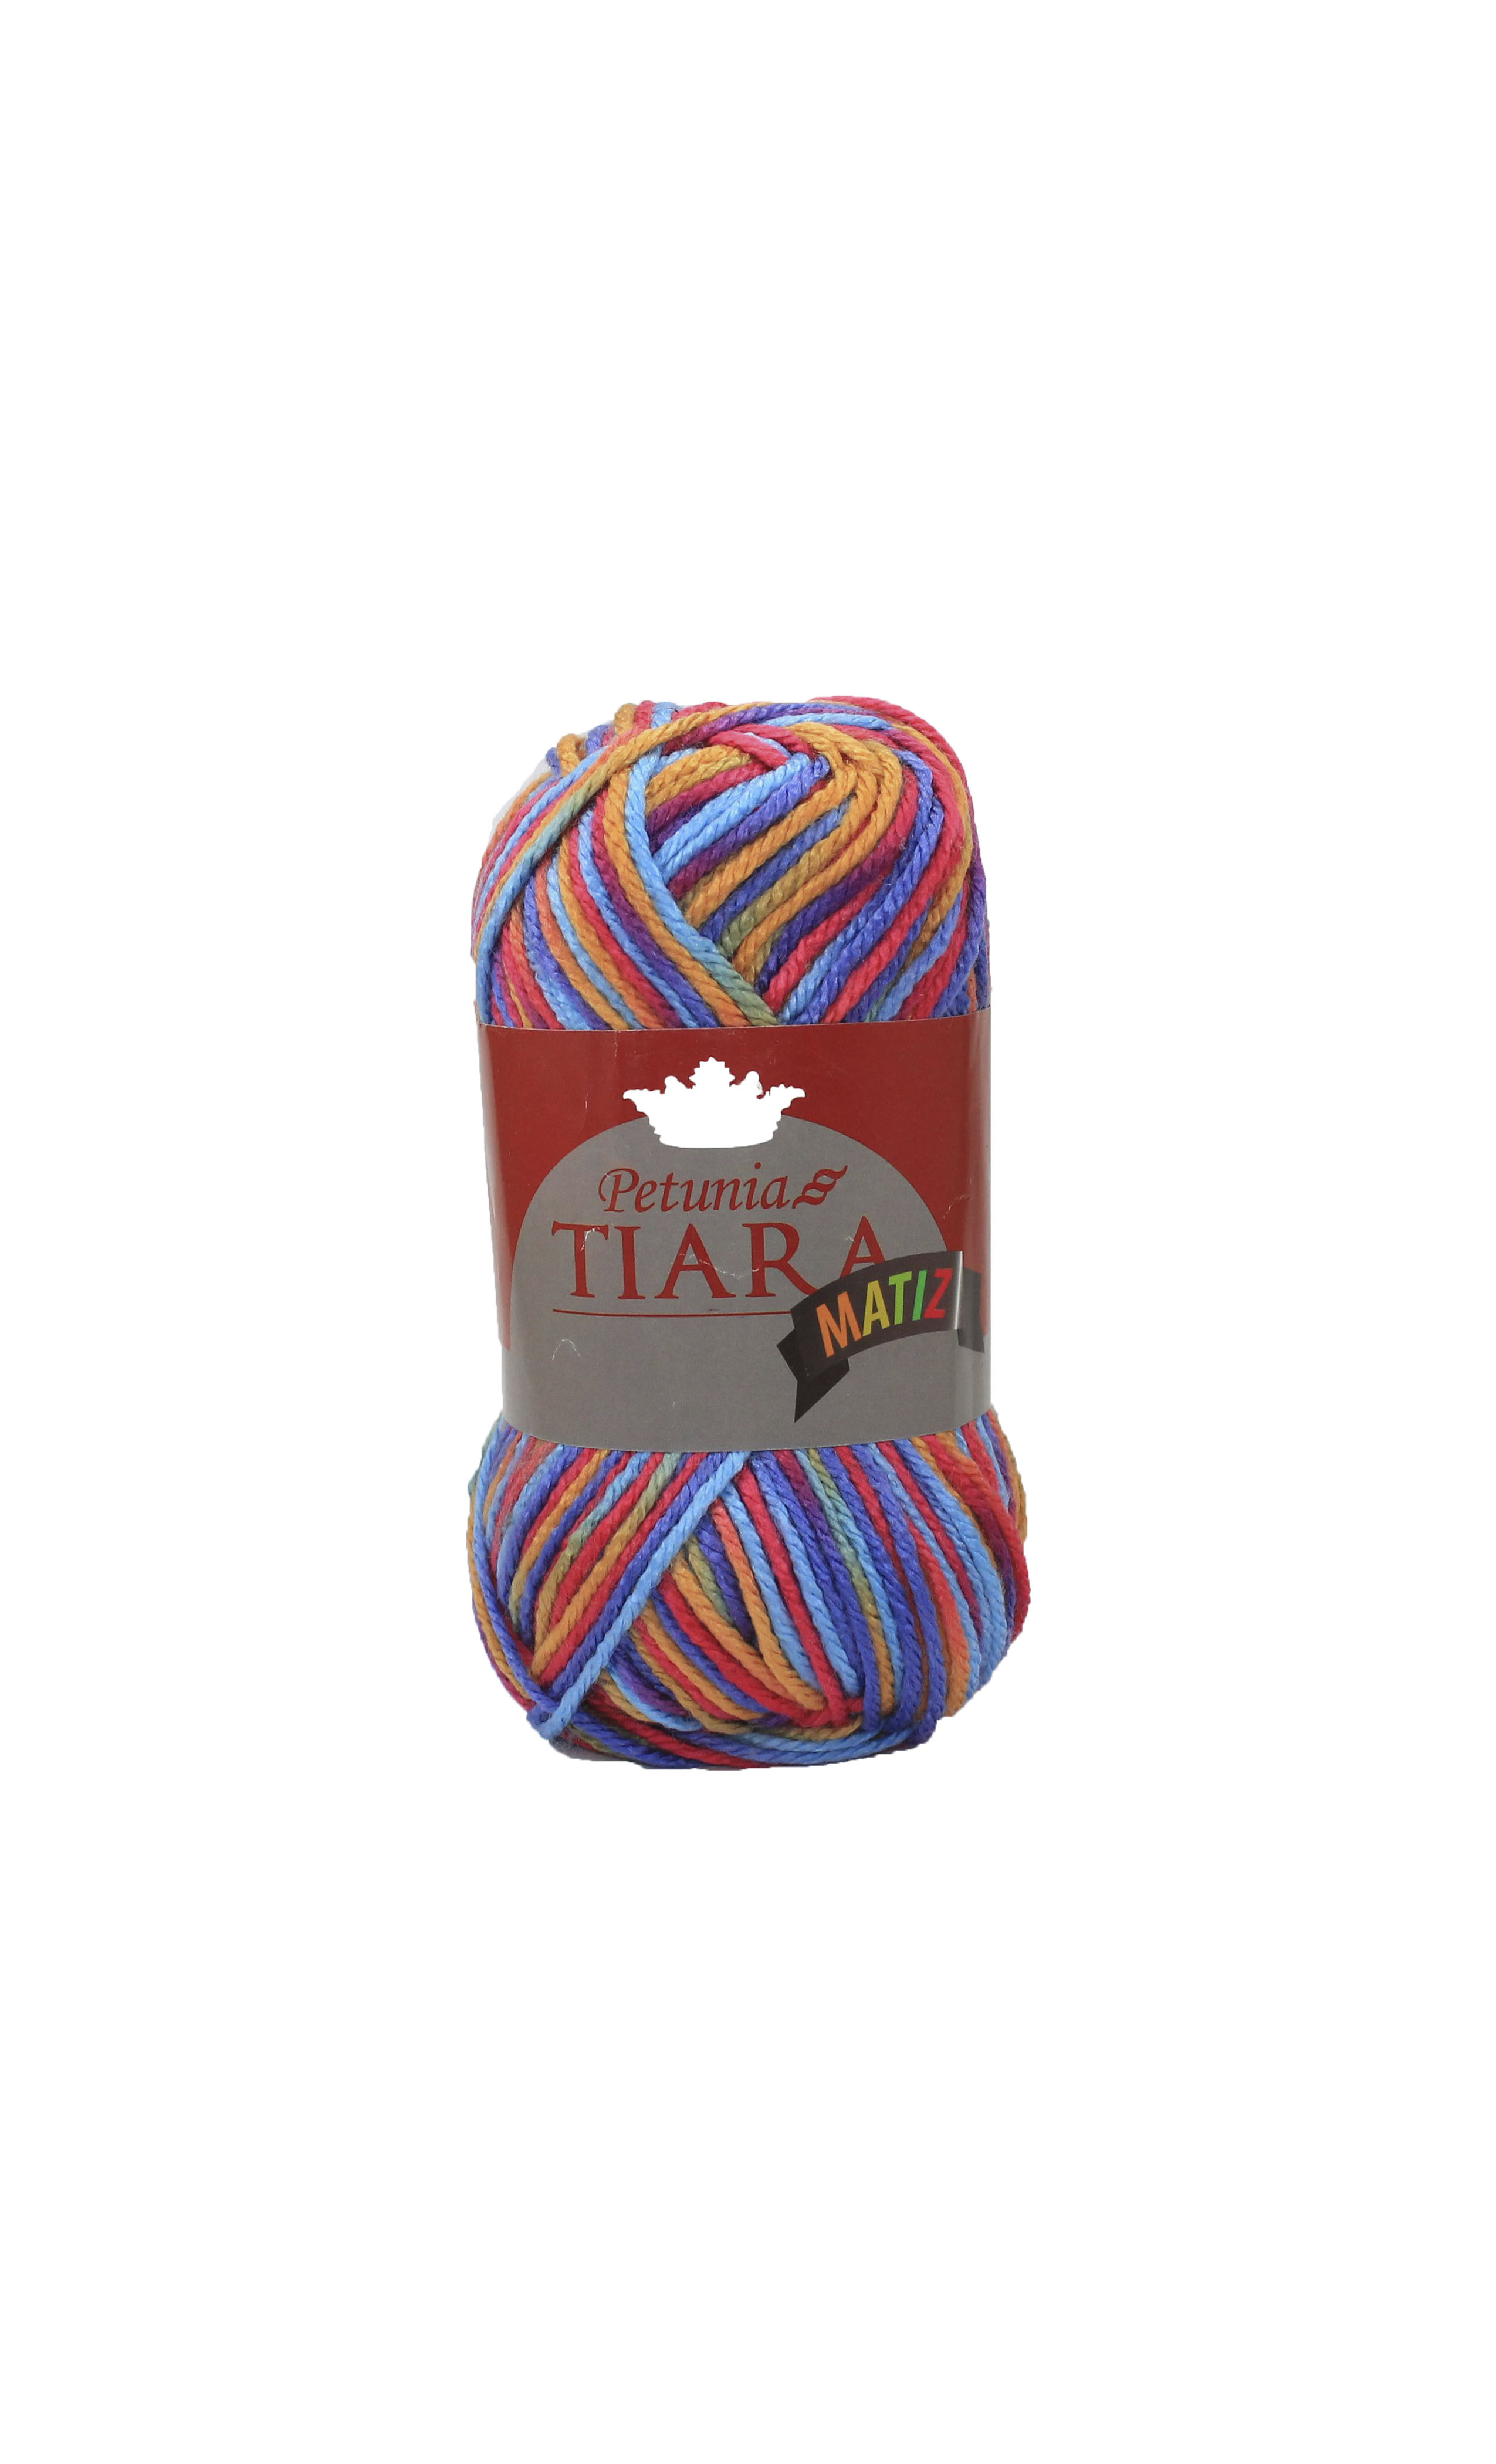 Tiara Matiz - 981